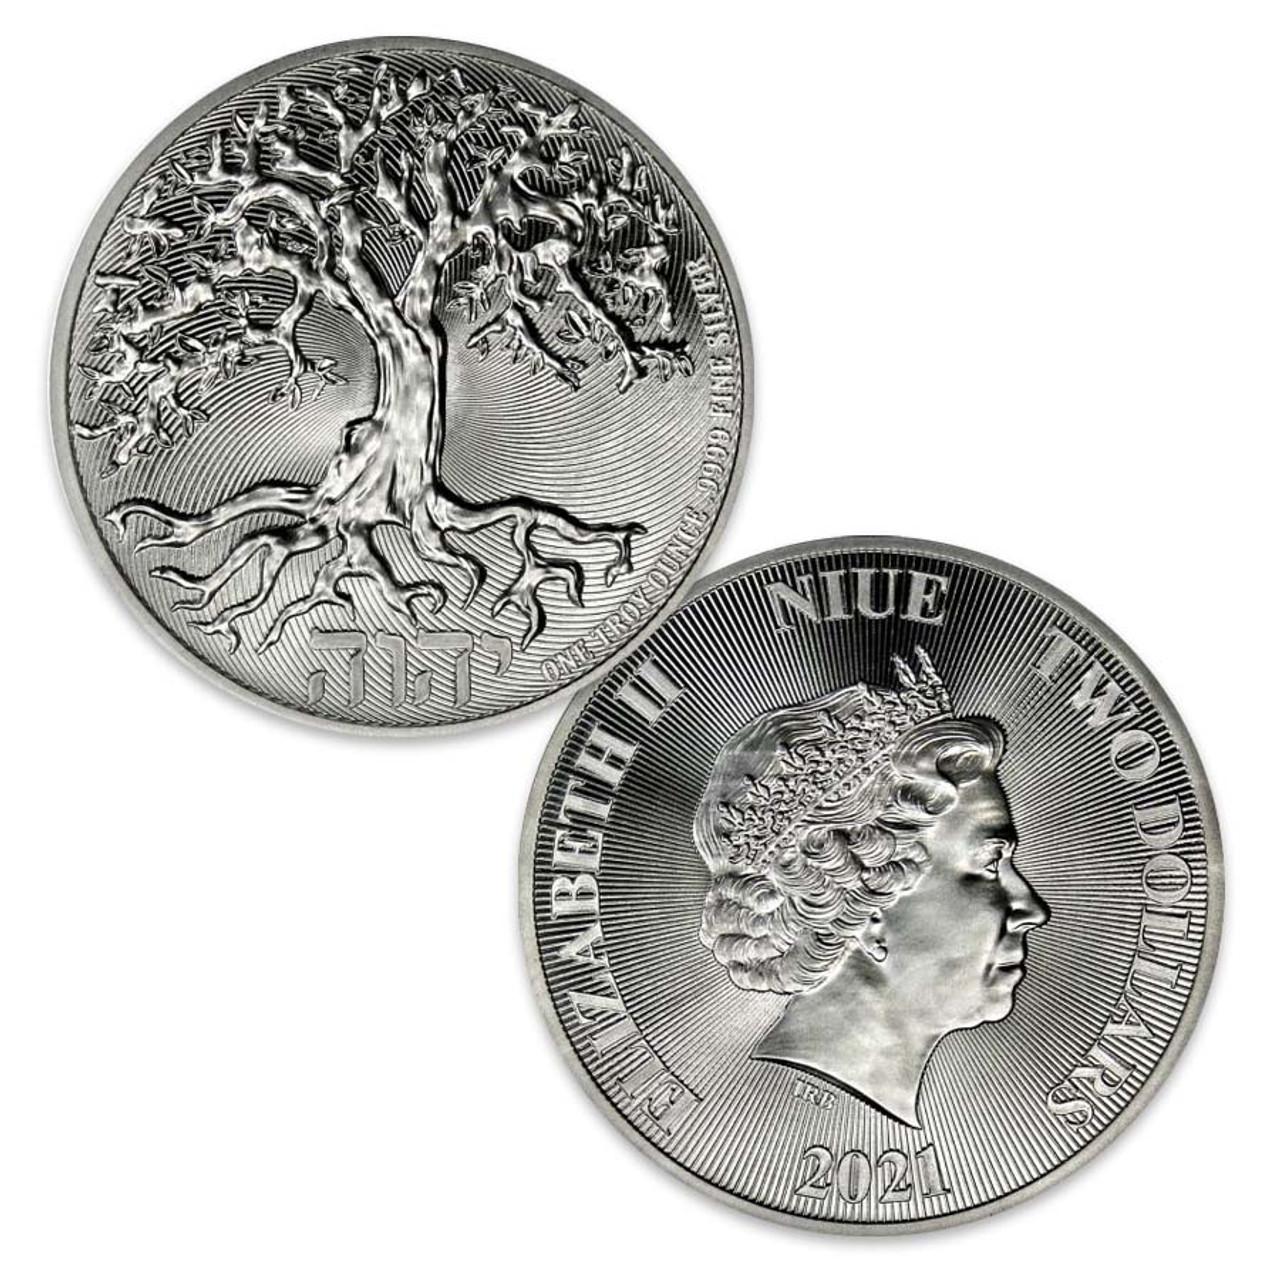 Niue Island 2021 Tree of Life 1-Oz. Silver $2 Brilliant Uncirculated